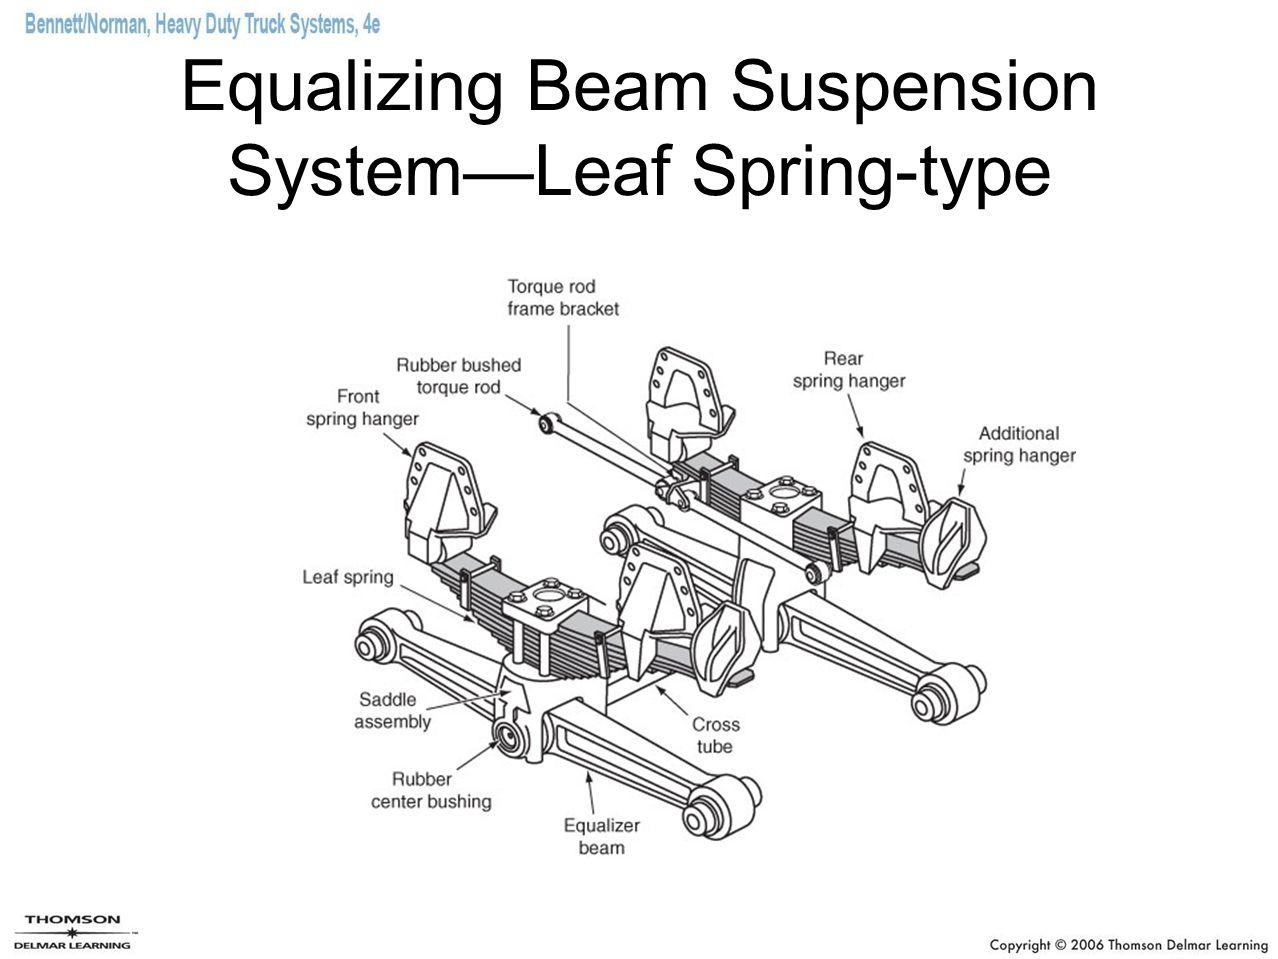 hight resolution of 17 equalizing beam suspension system leaf spring type